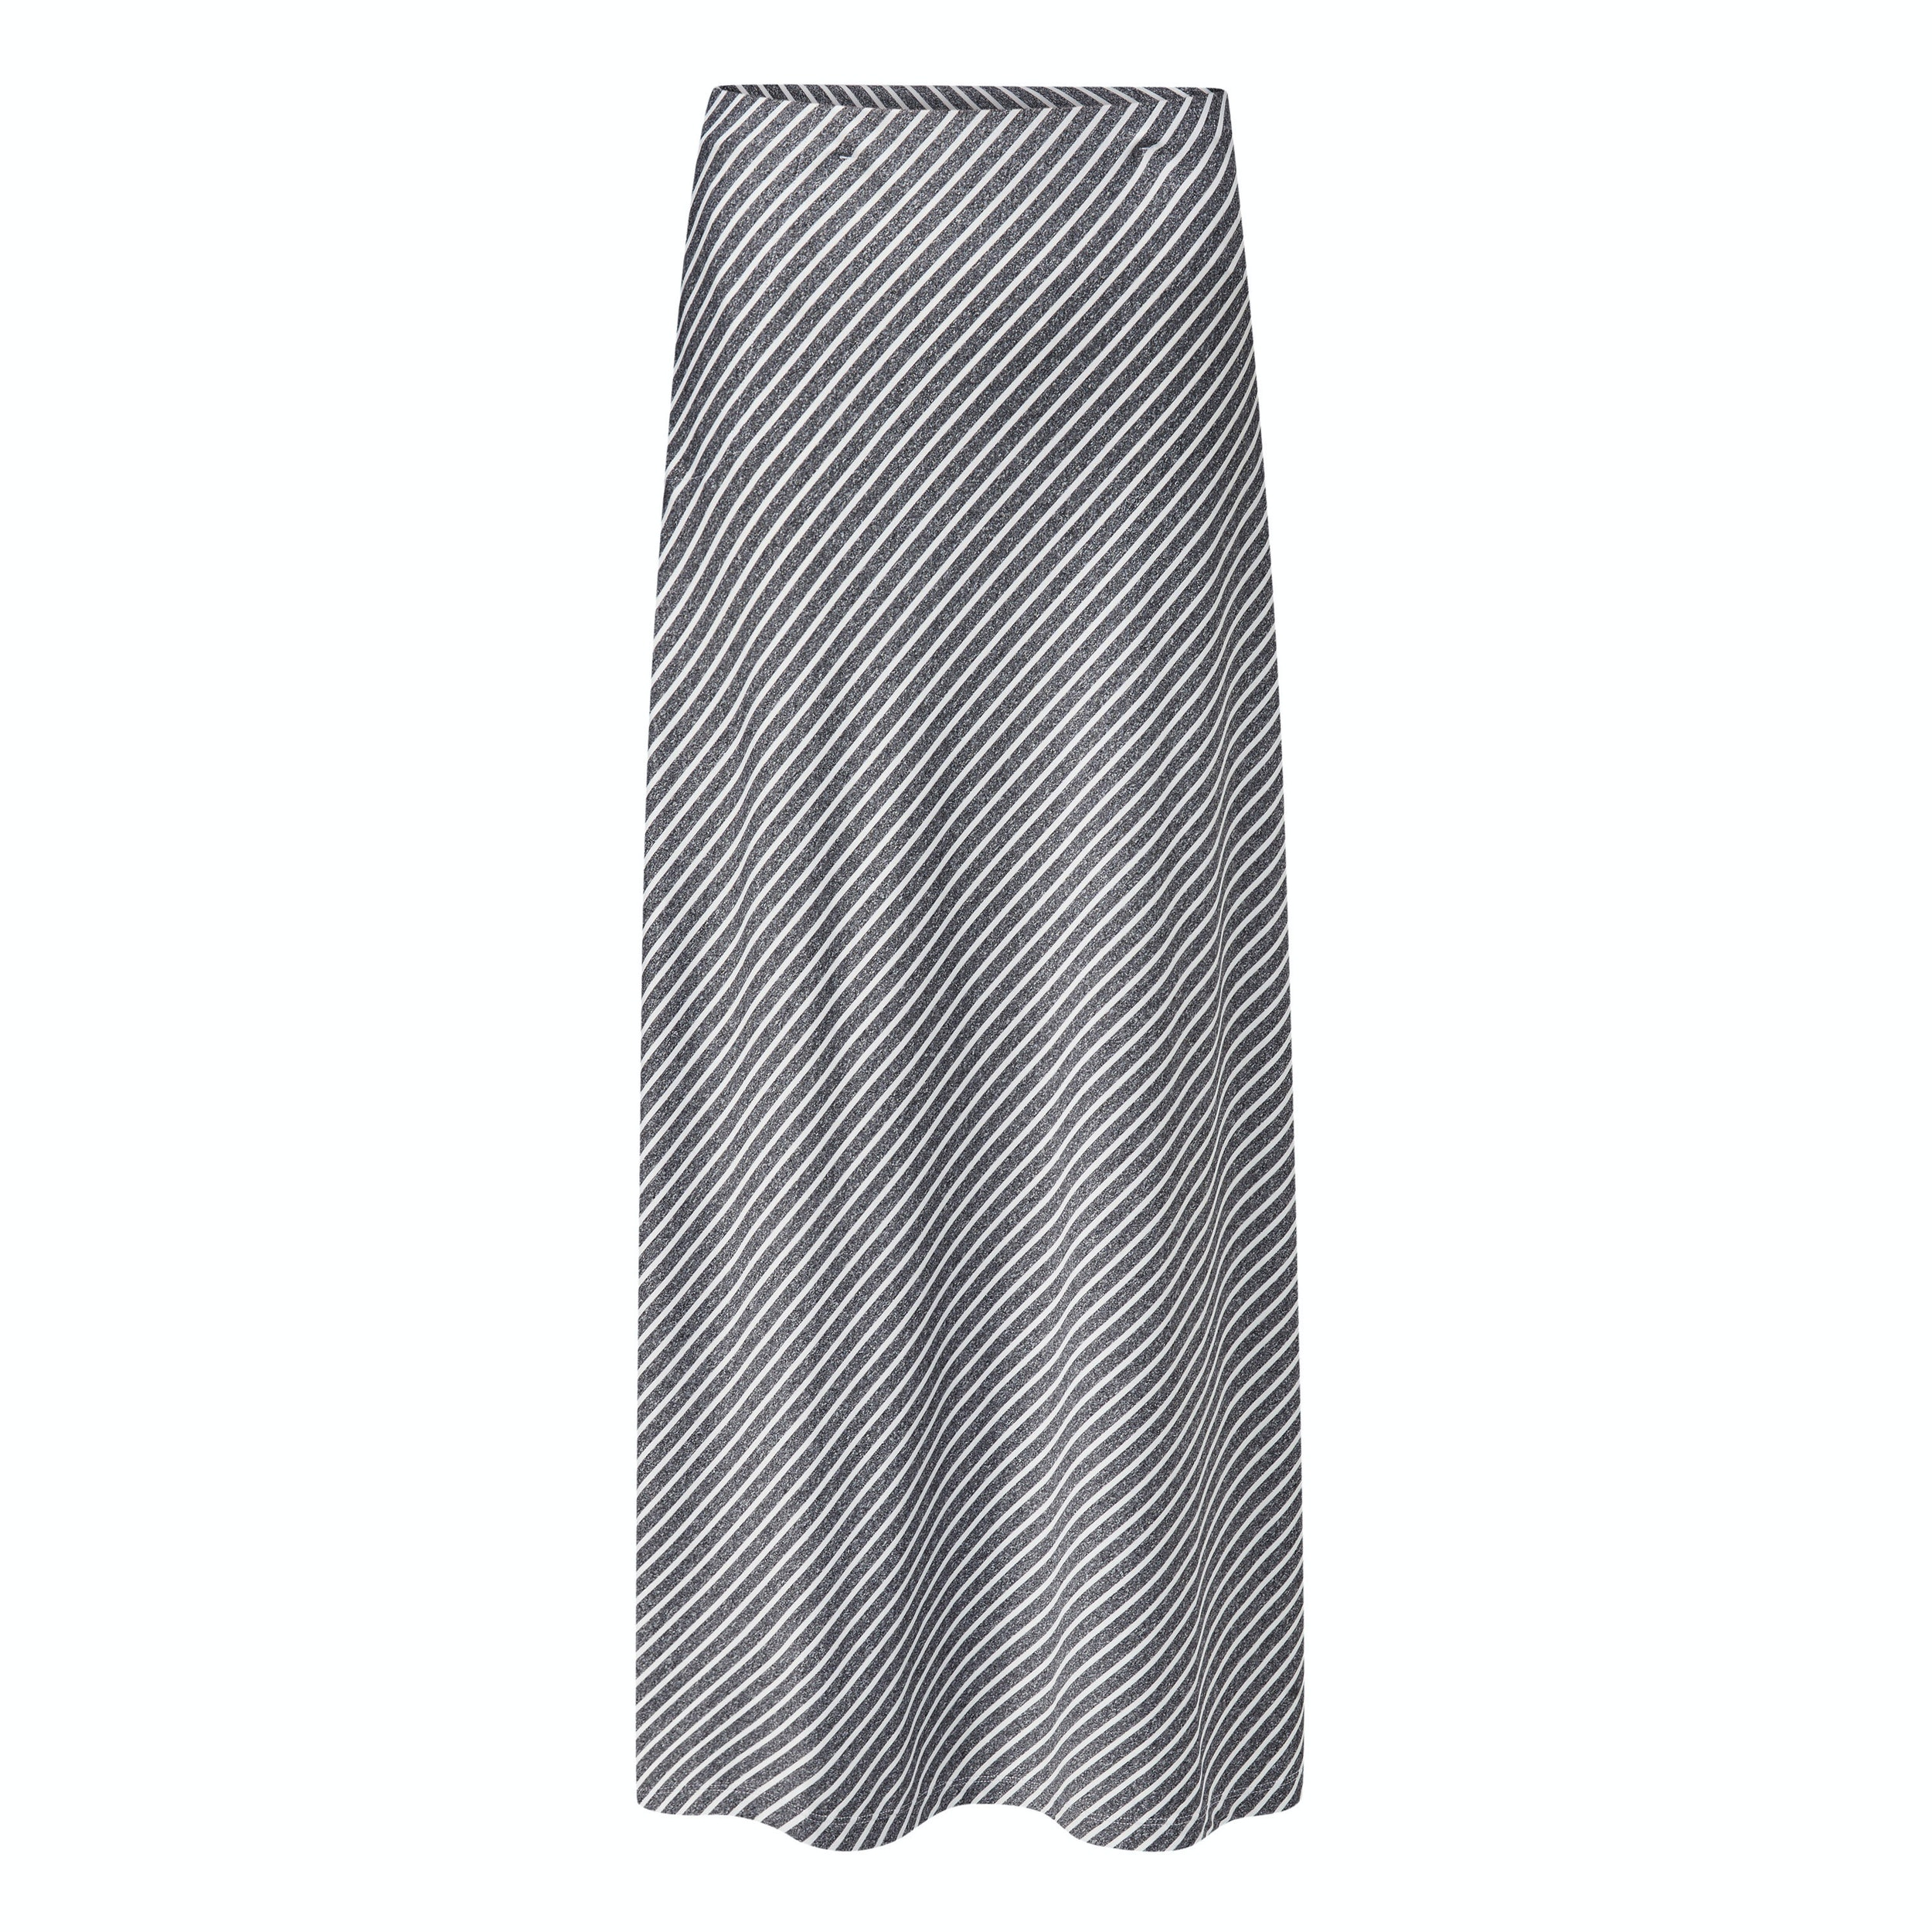 5cf0e62f94 Women's Serenity Long Skirt - Travel skirt with Coolant fabric ...